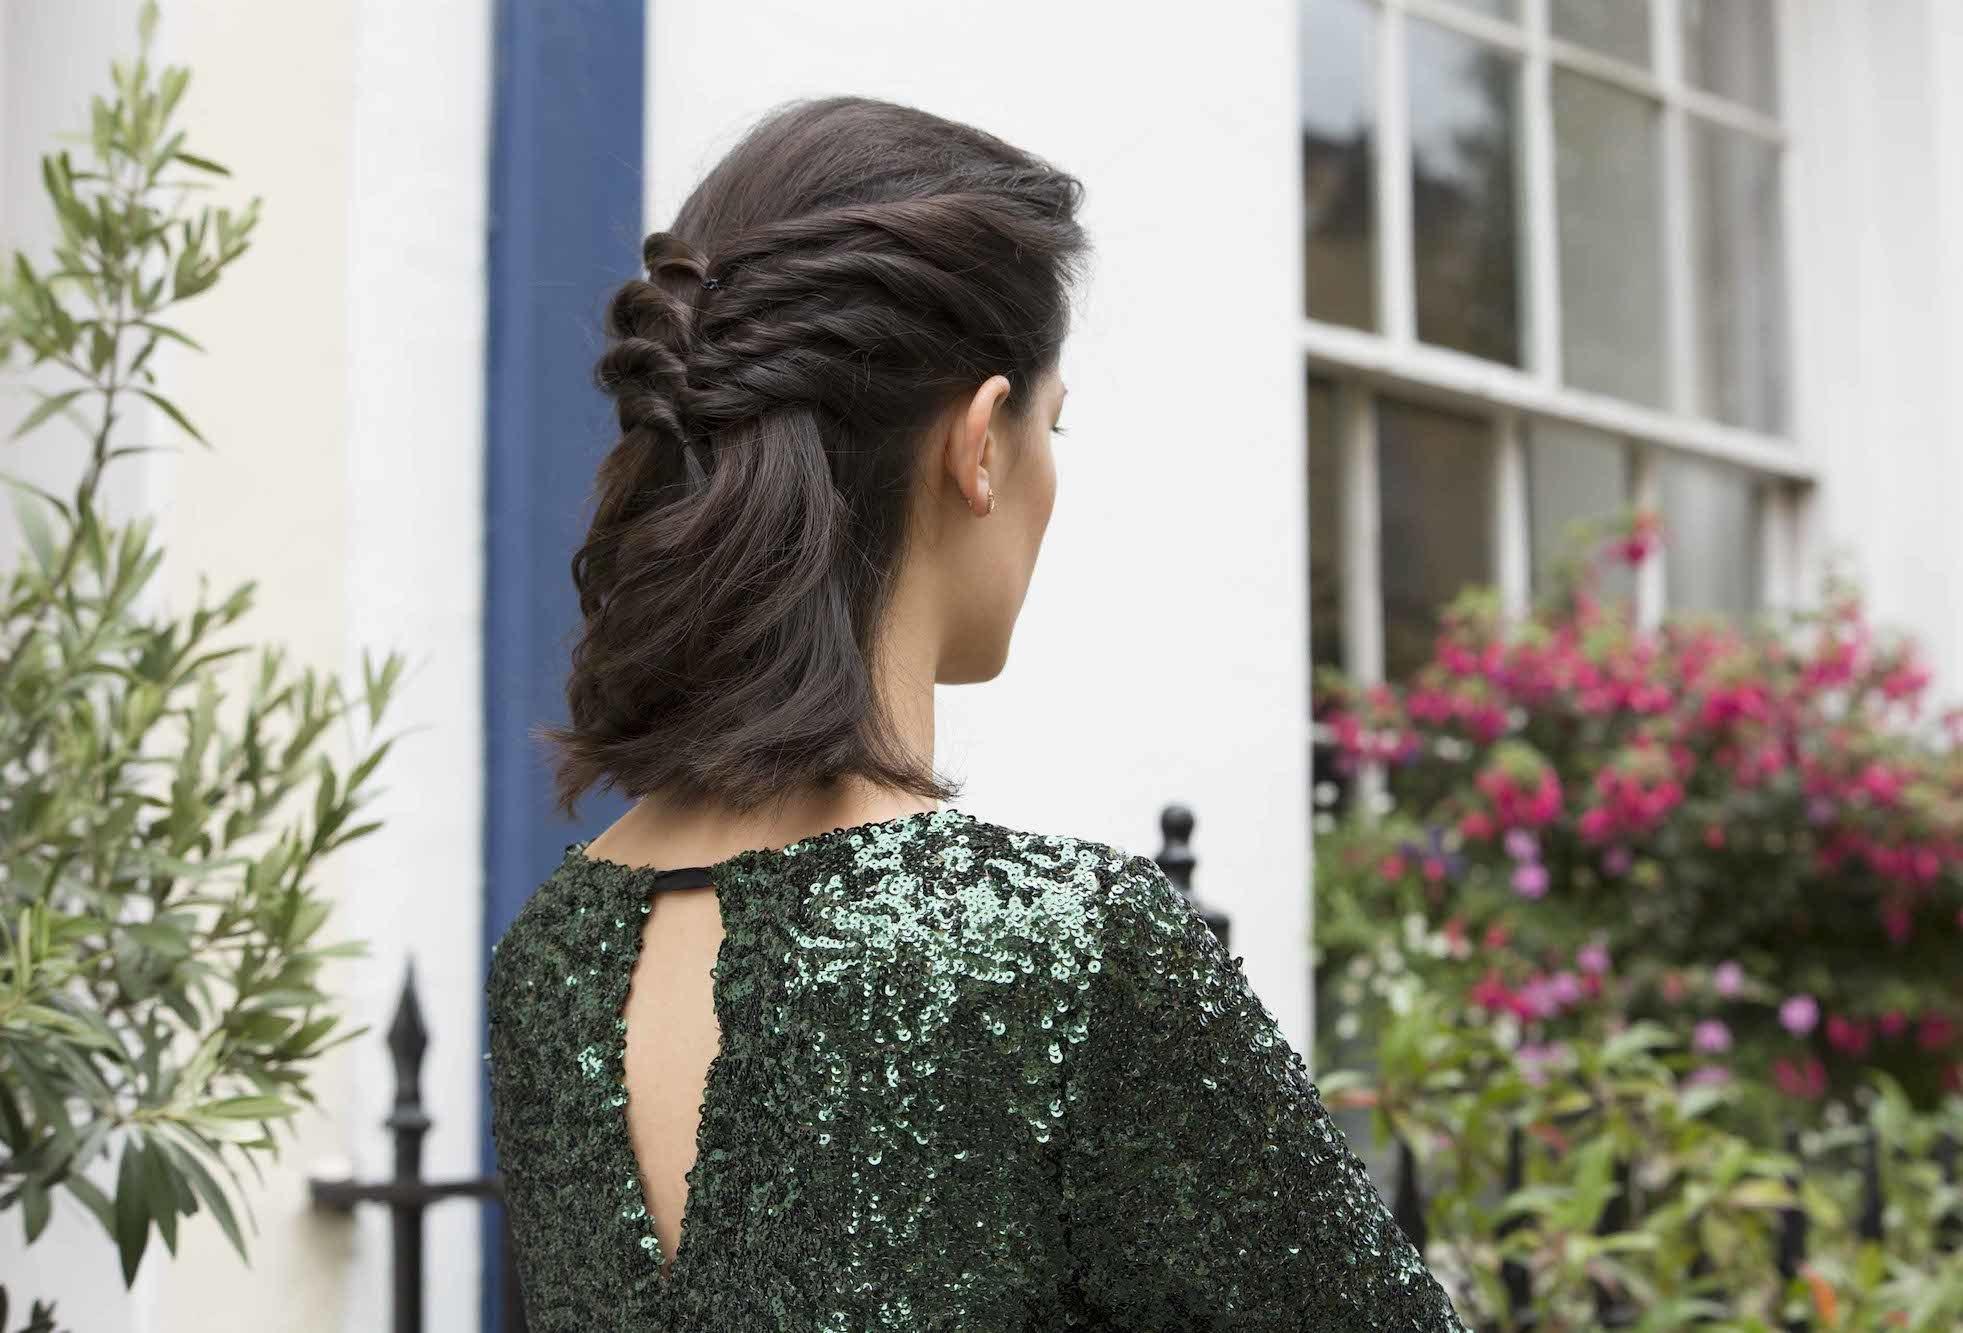 Gaya rambut twist dengan model rambut half updo twisted.